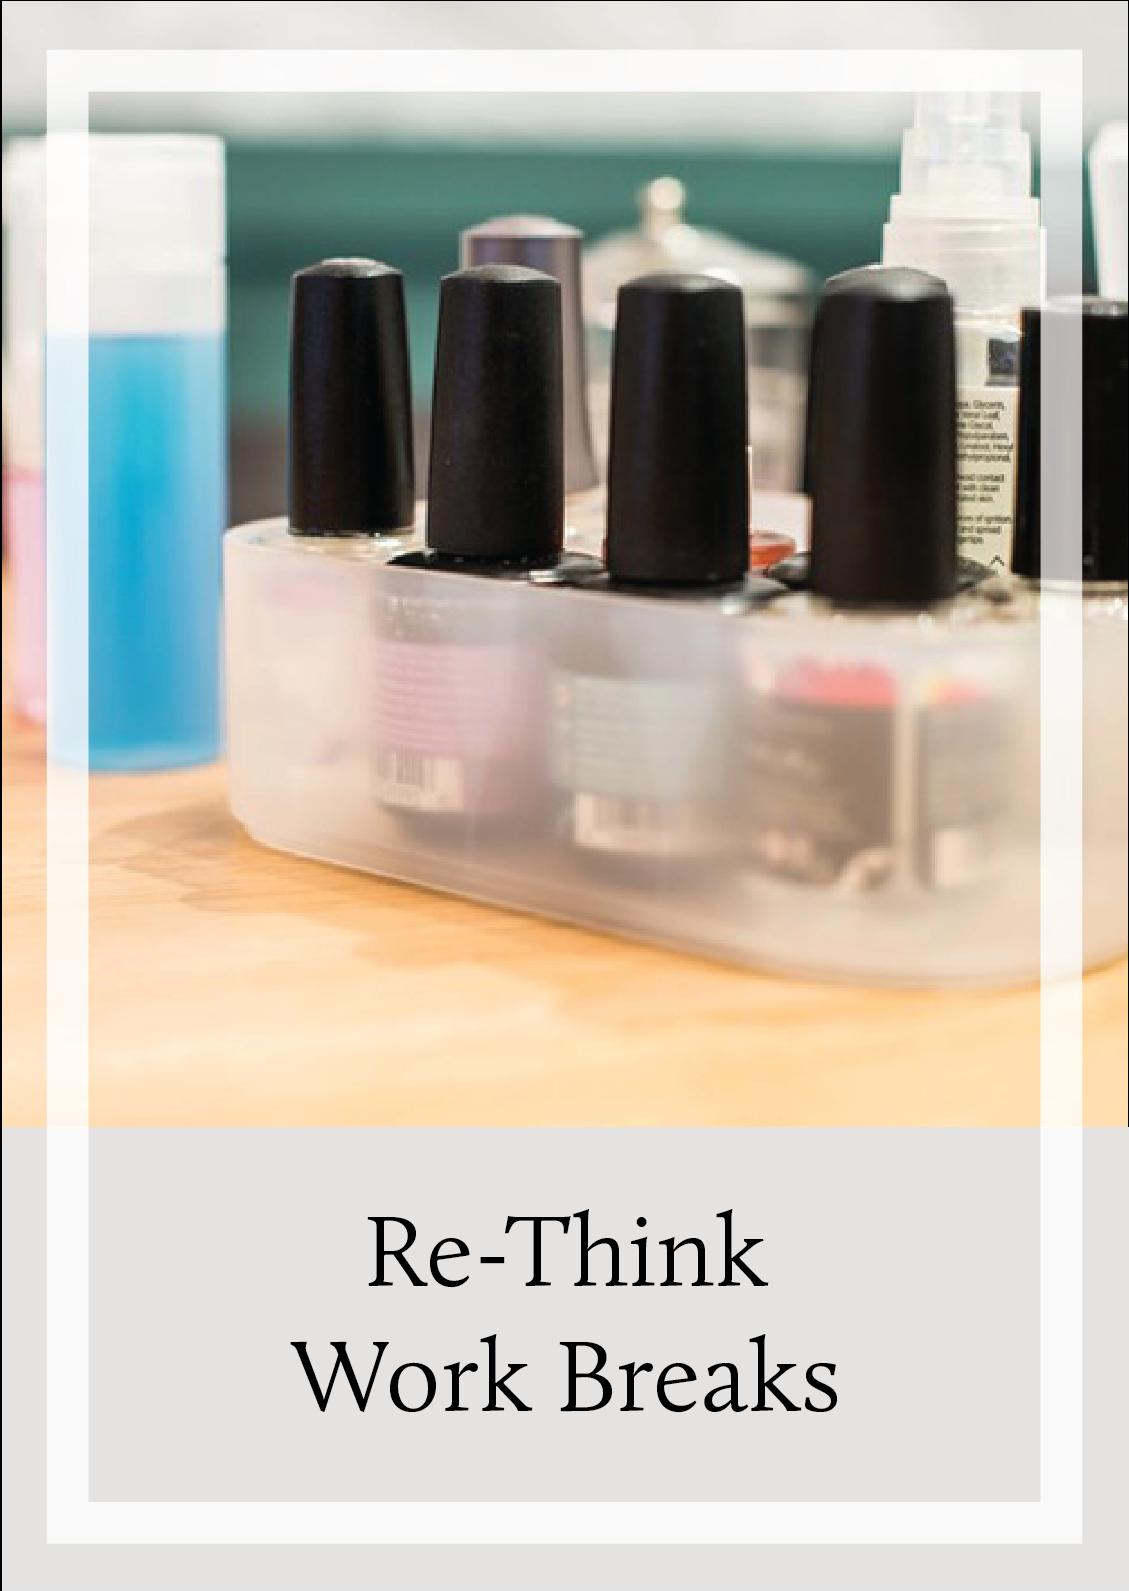 MINC Beauty : Convenient In-Office Beauty Treatments for Work Breaks